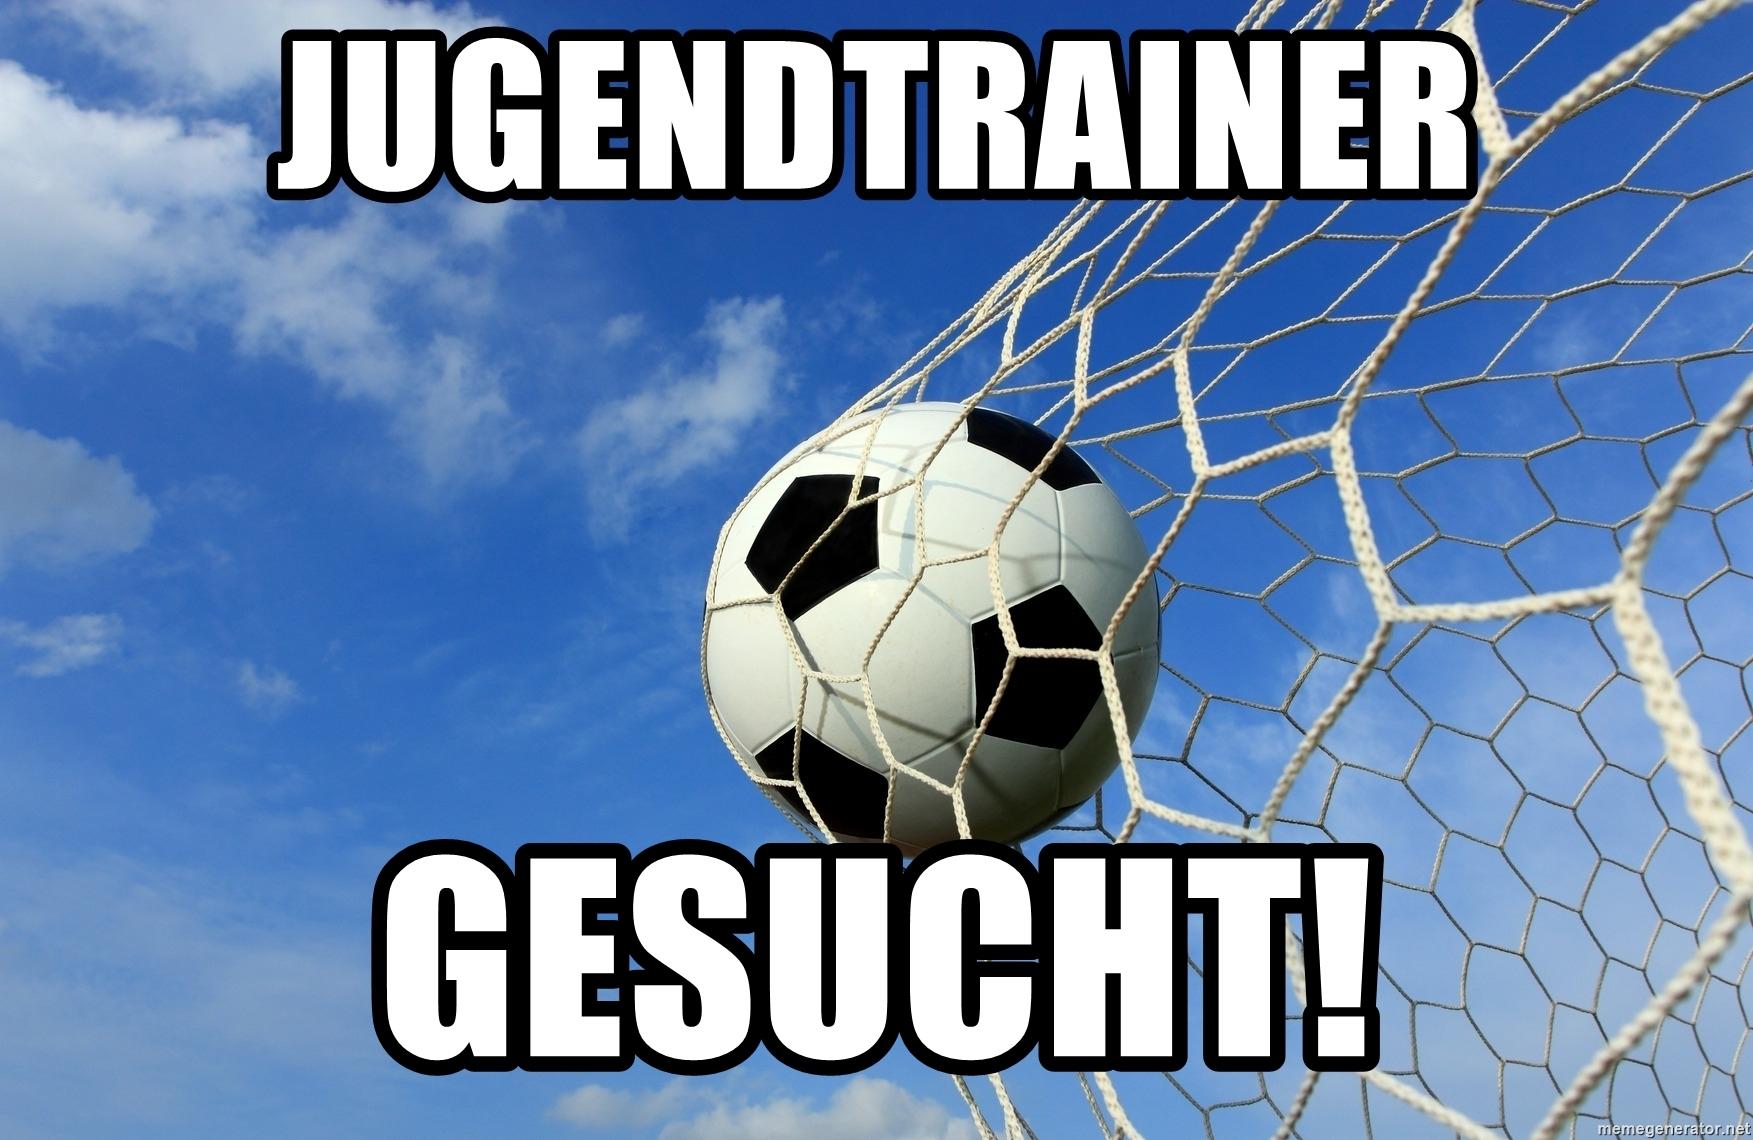 Jugendtrainer Fußball in Witten gesucht